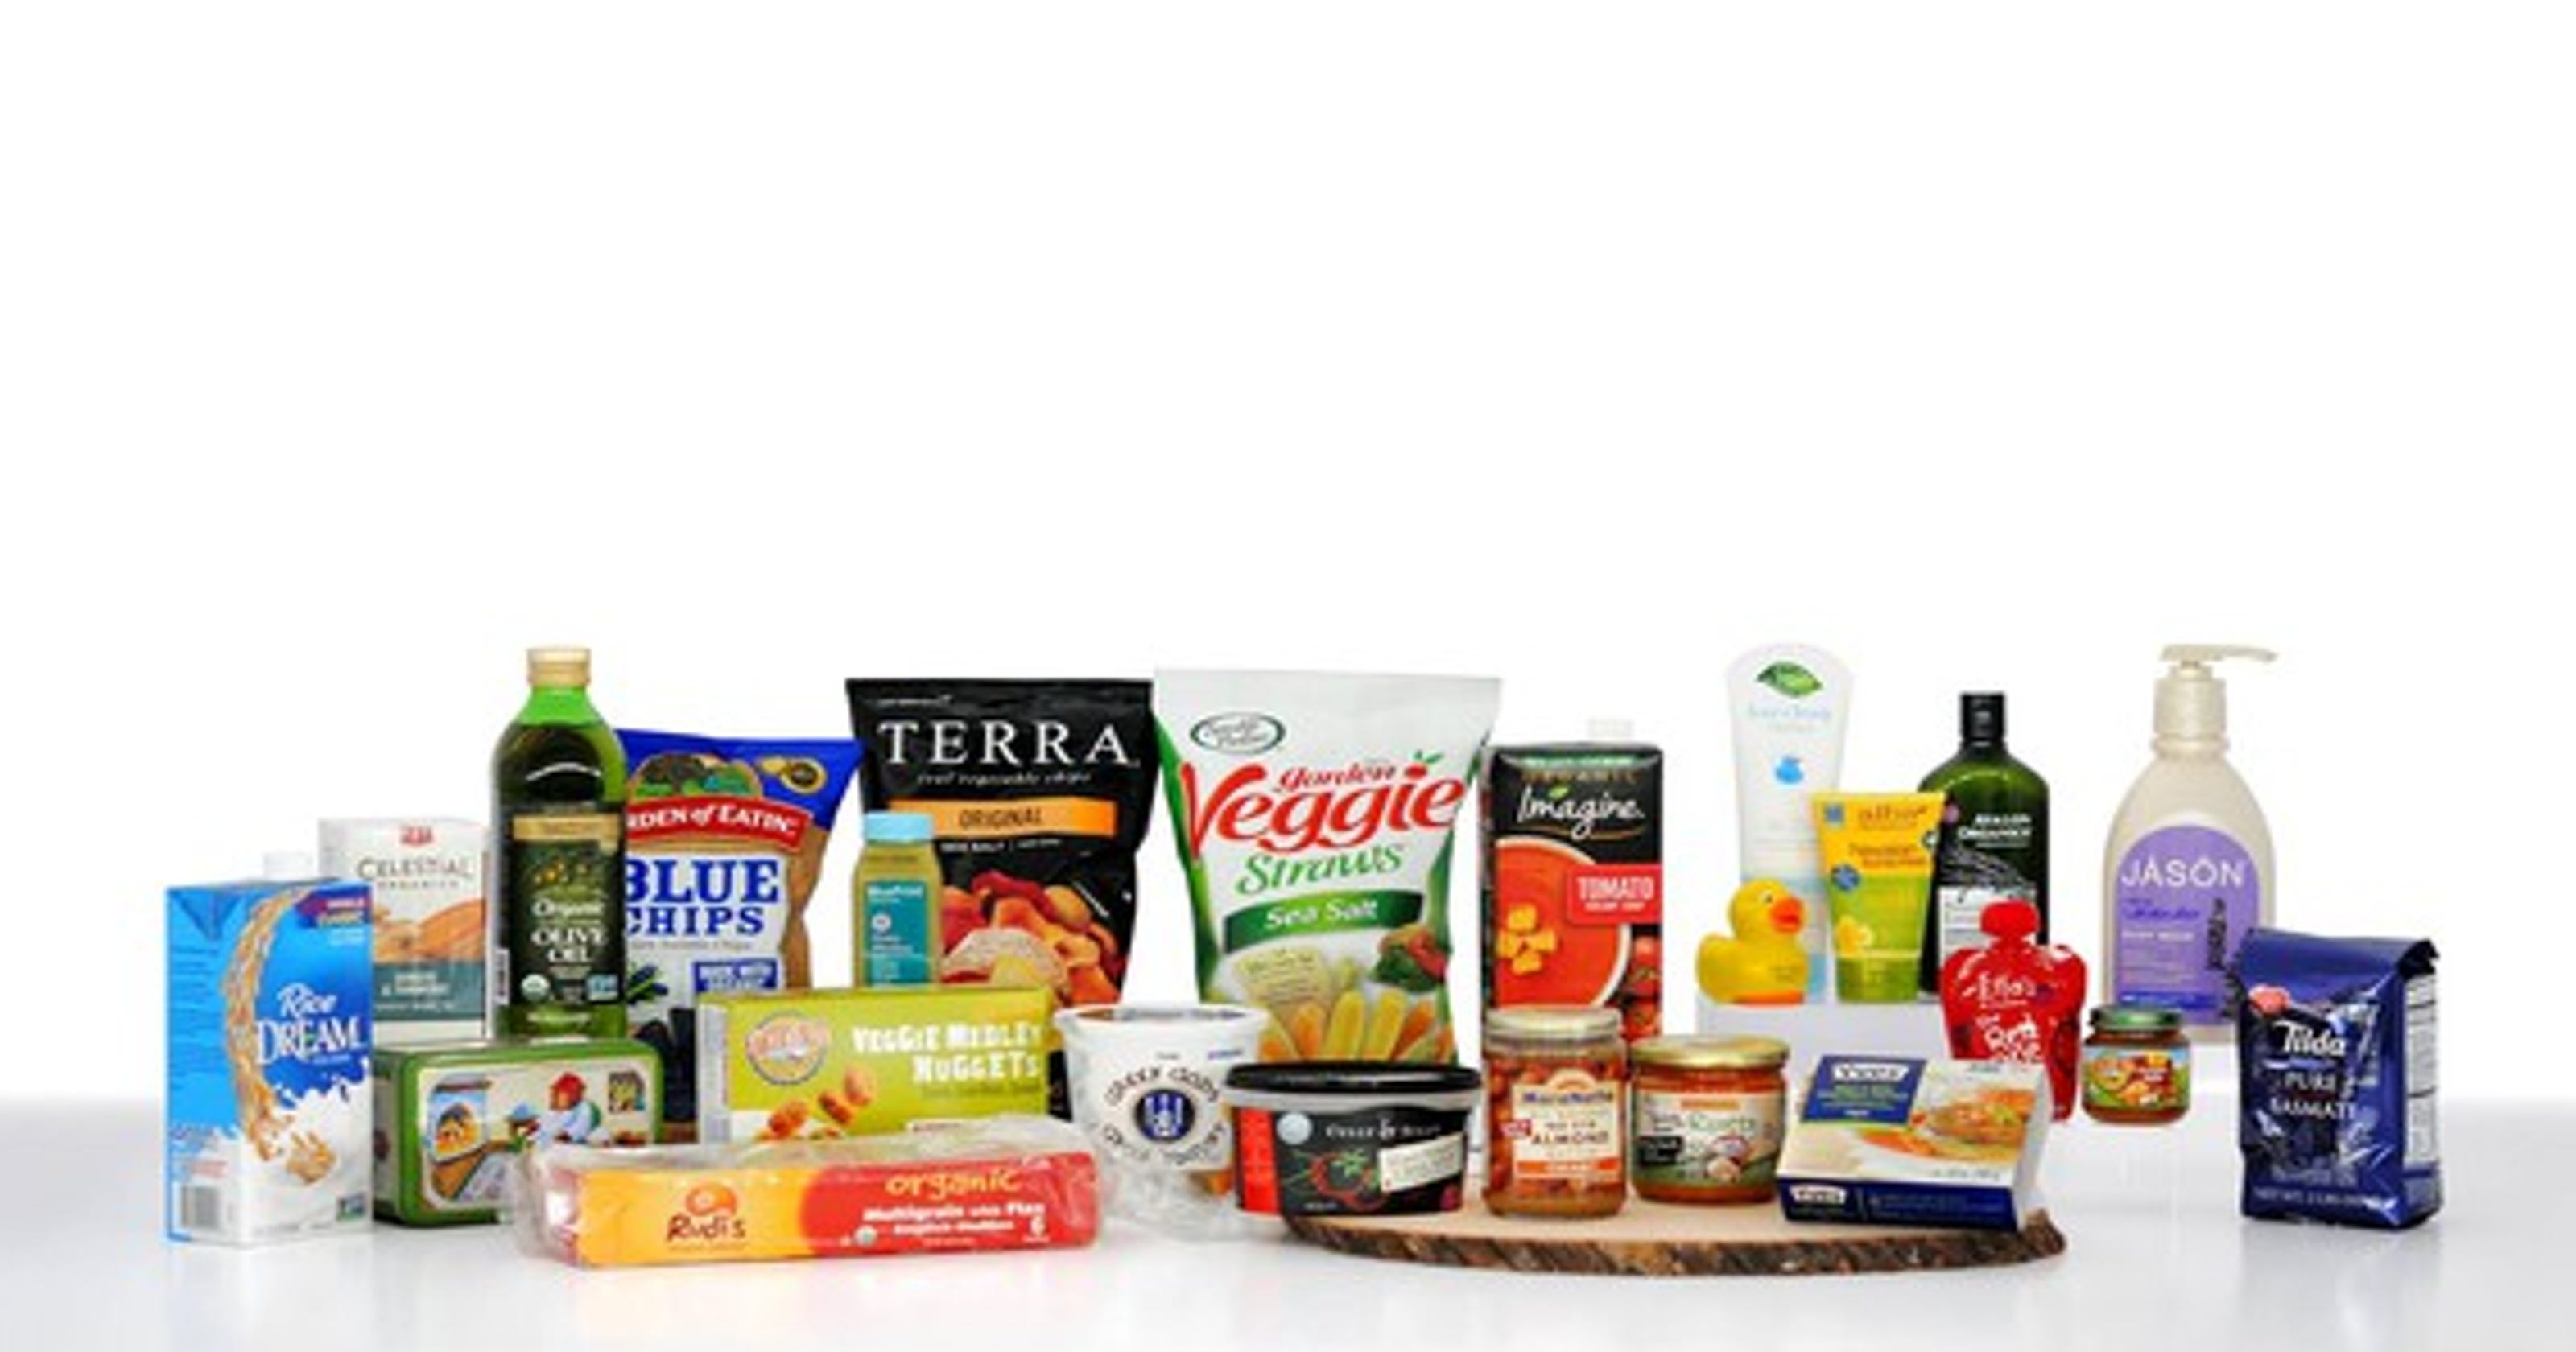 Organic food maker Hain Celestial misses estimates, eyes divestiture